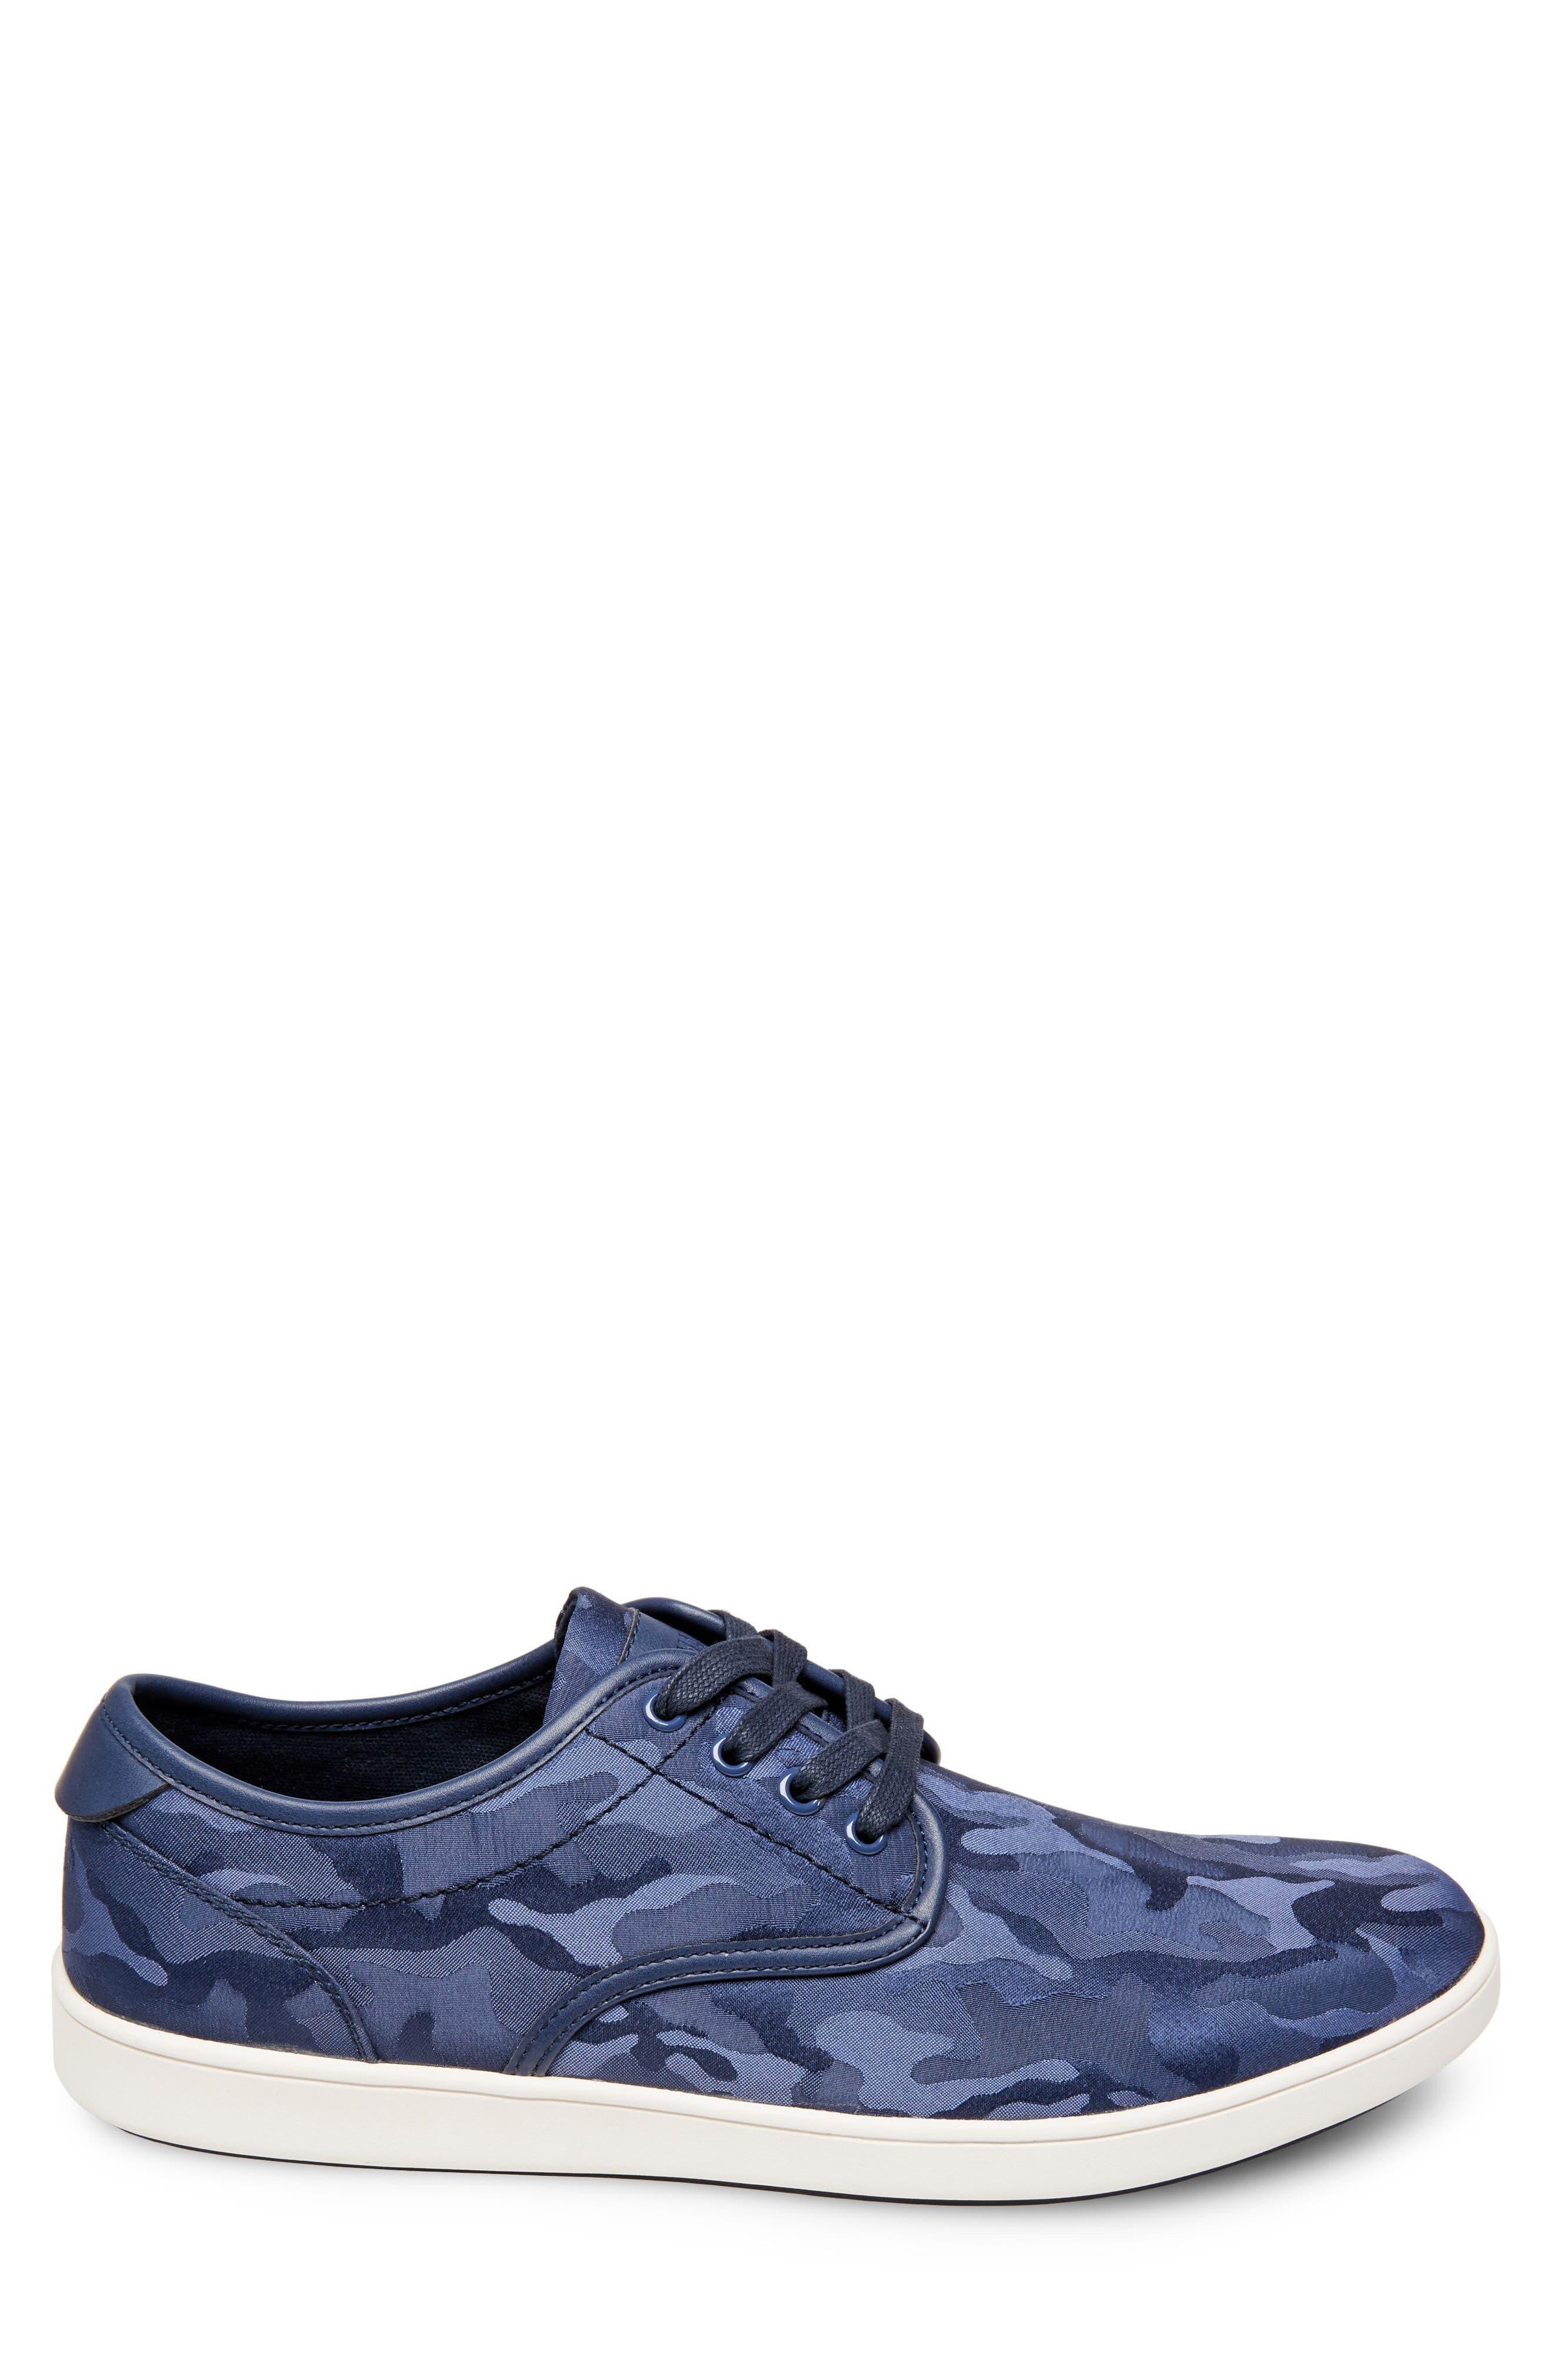 Frenzo Camo Sneaker,                             Alternate thumbnail 4, color,                             Blue Camo Fabric